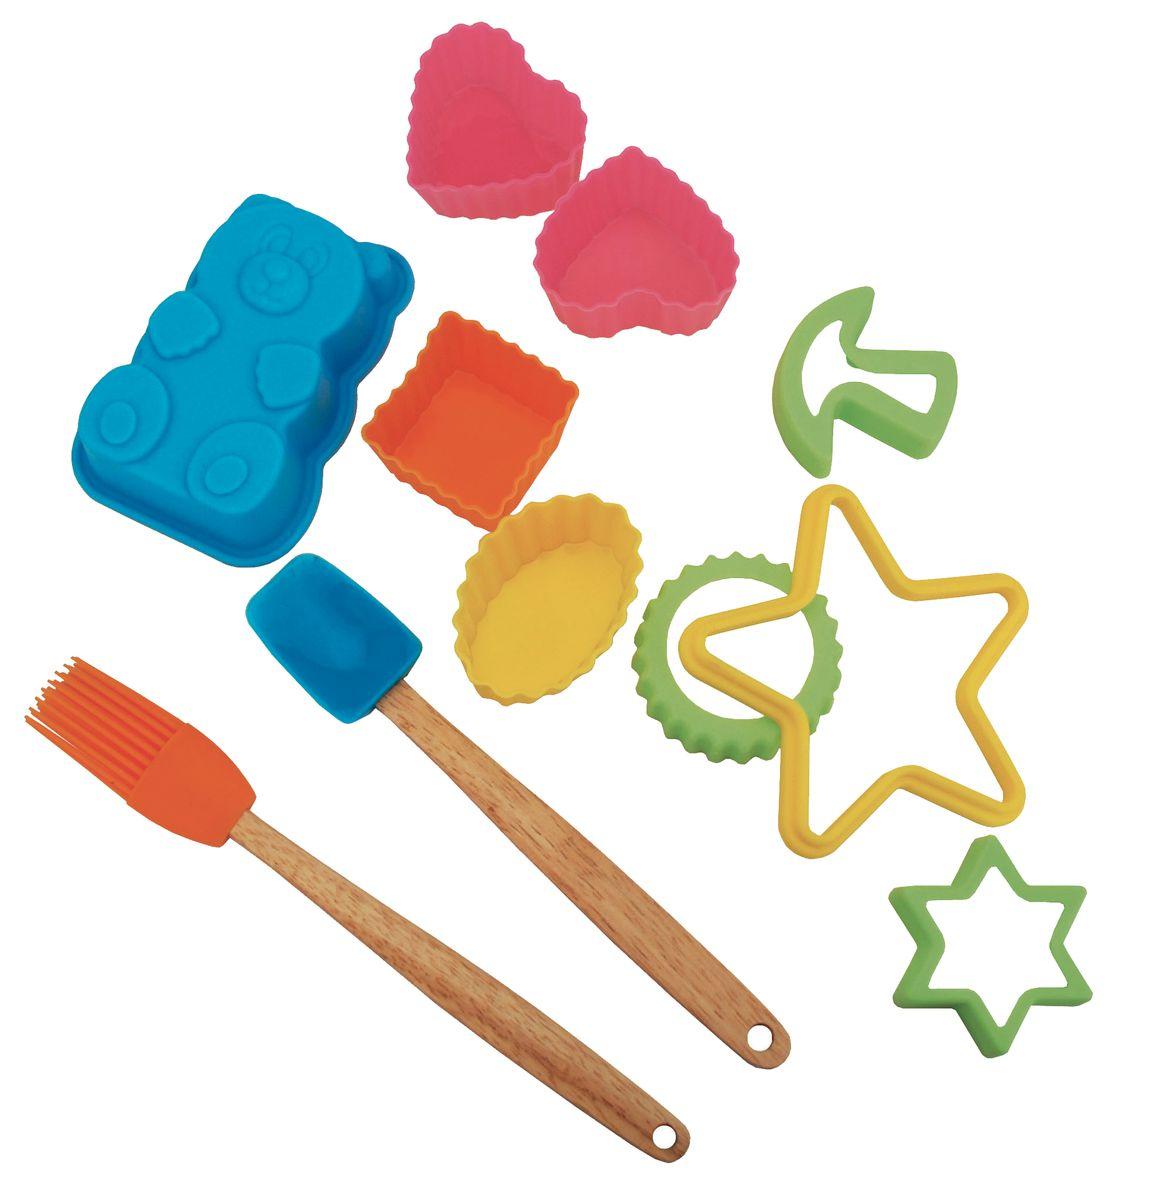 IRIS Детский набор для выпечки, 11 предм. (пластик, дерево)2378-SIRIS Детский набор для выпечки, 11 предм. (пластик, дерево)